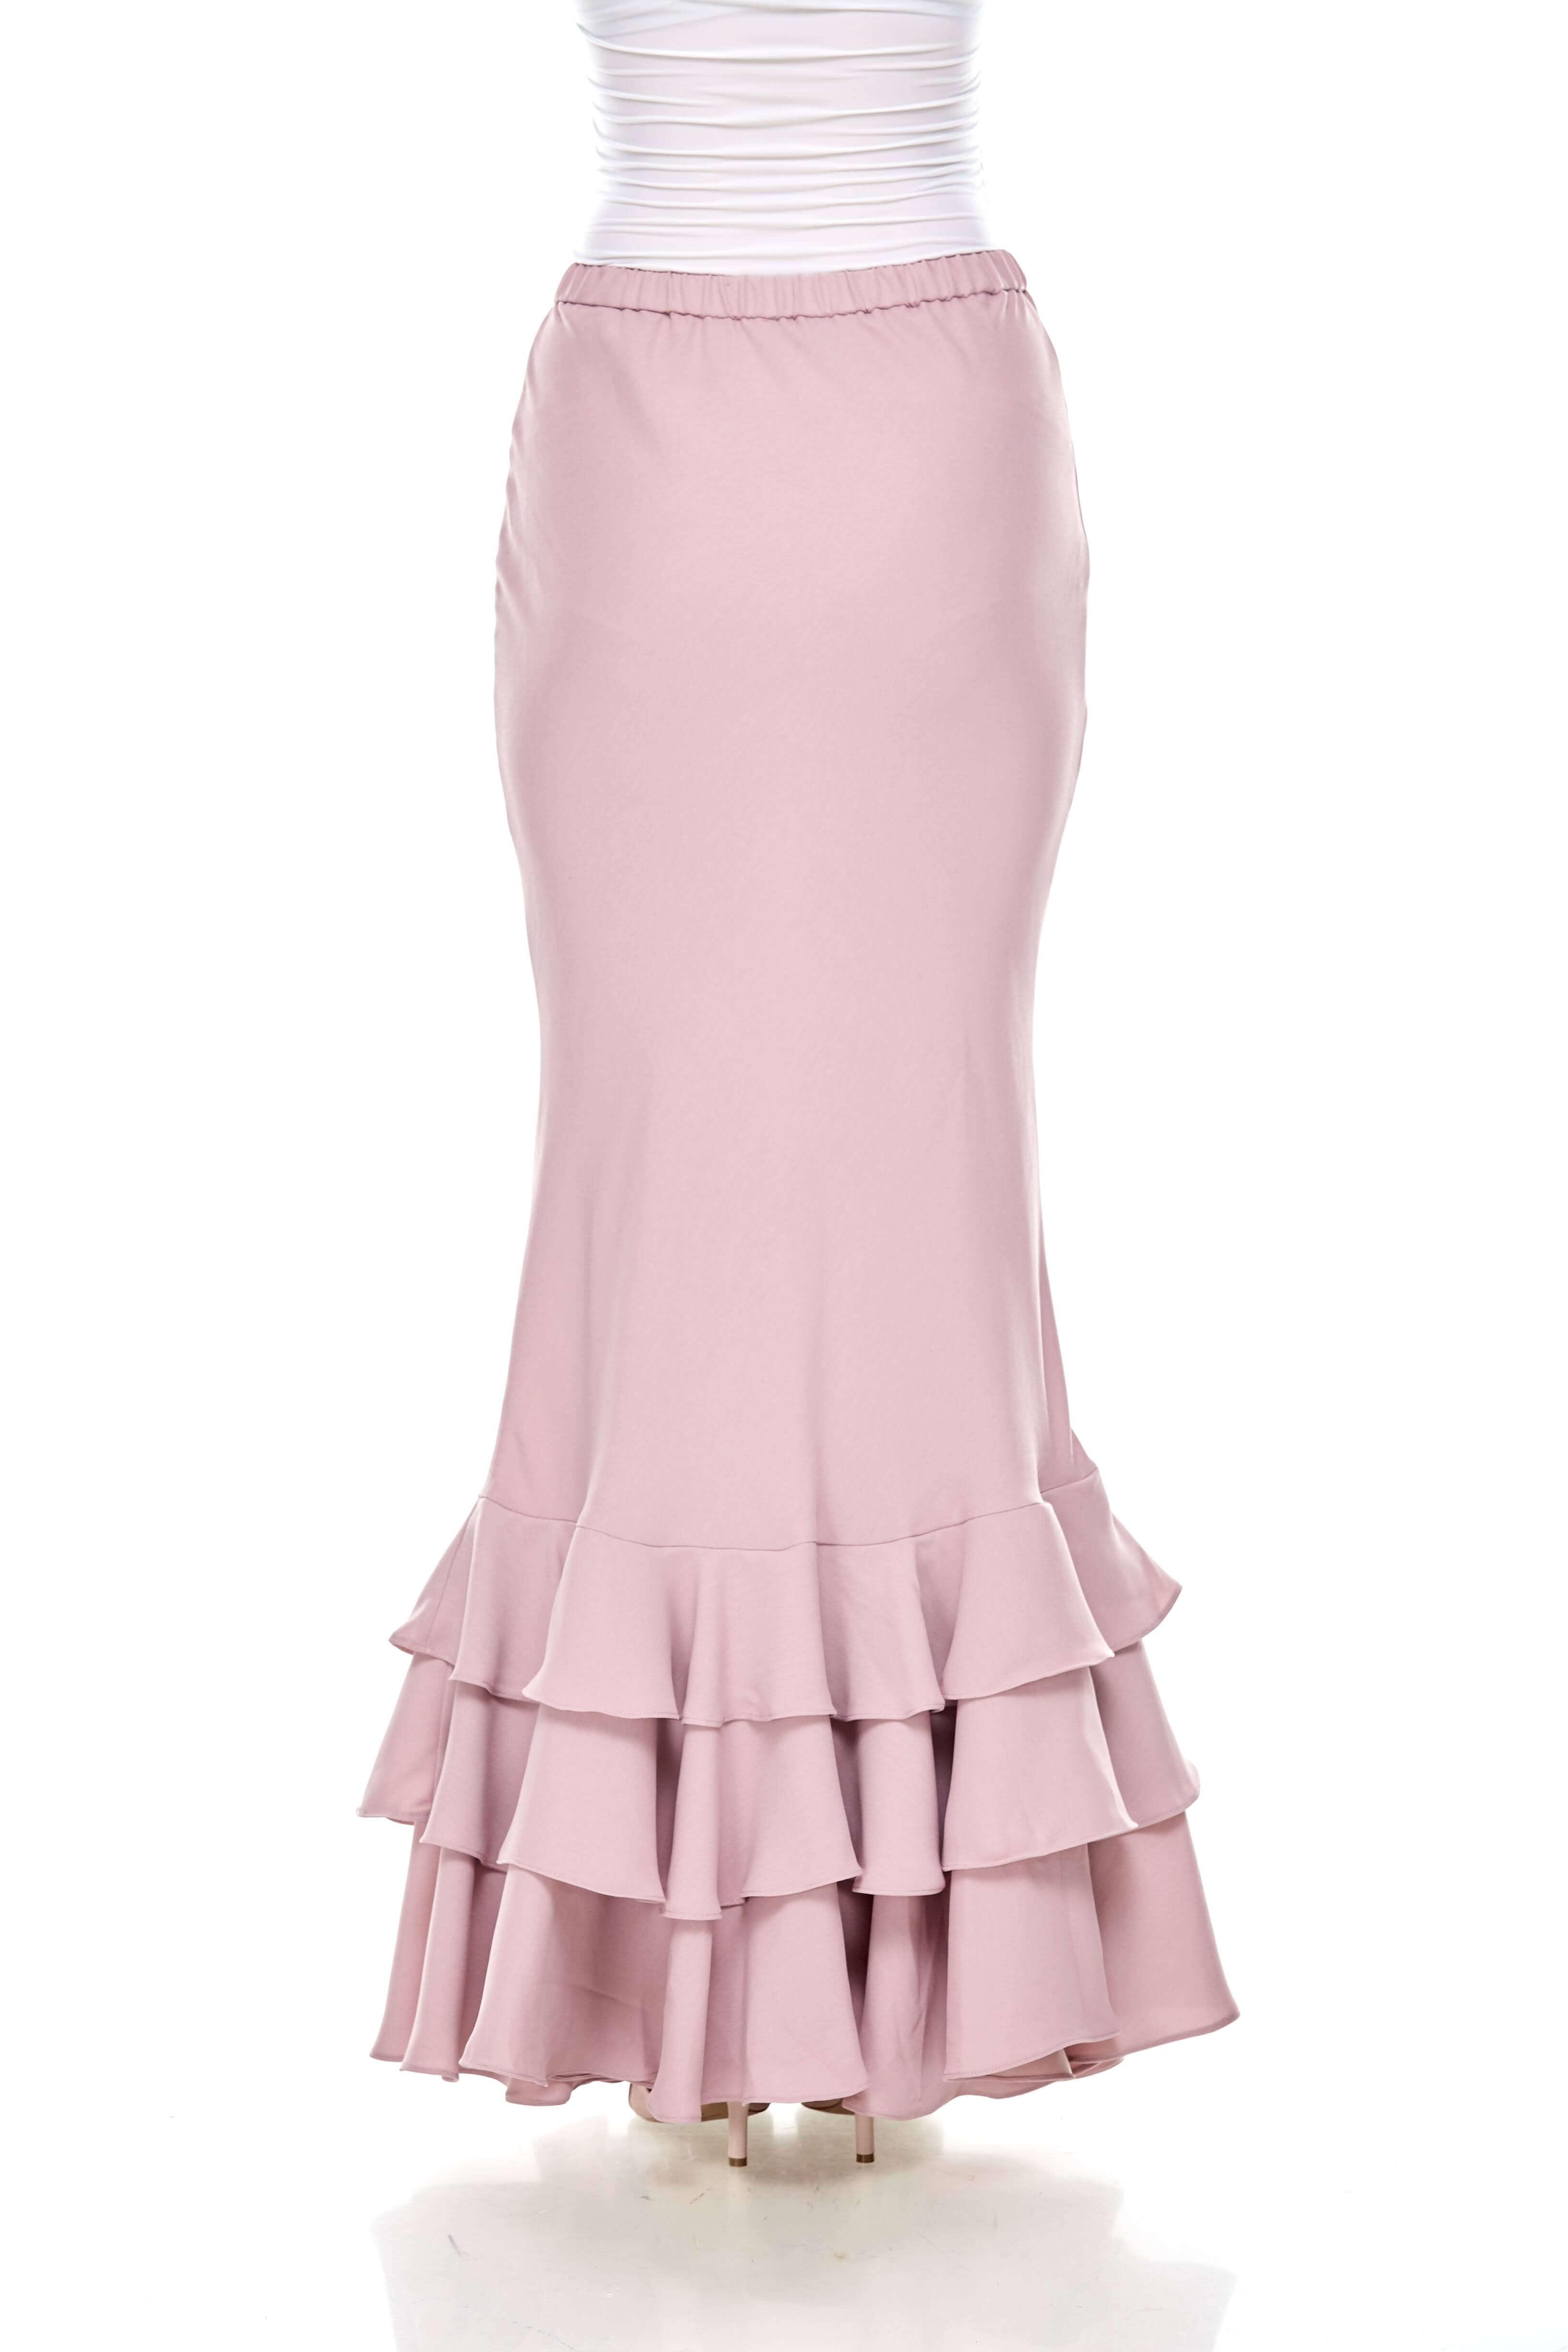 Rose Dawn Pink Ruffle Skirt (4)